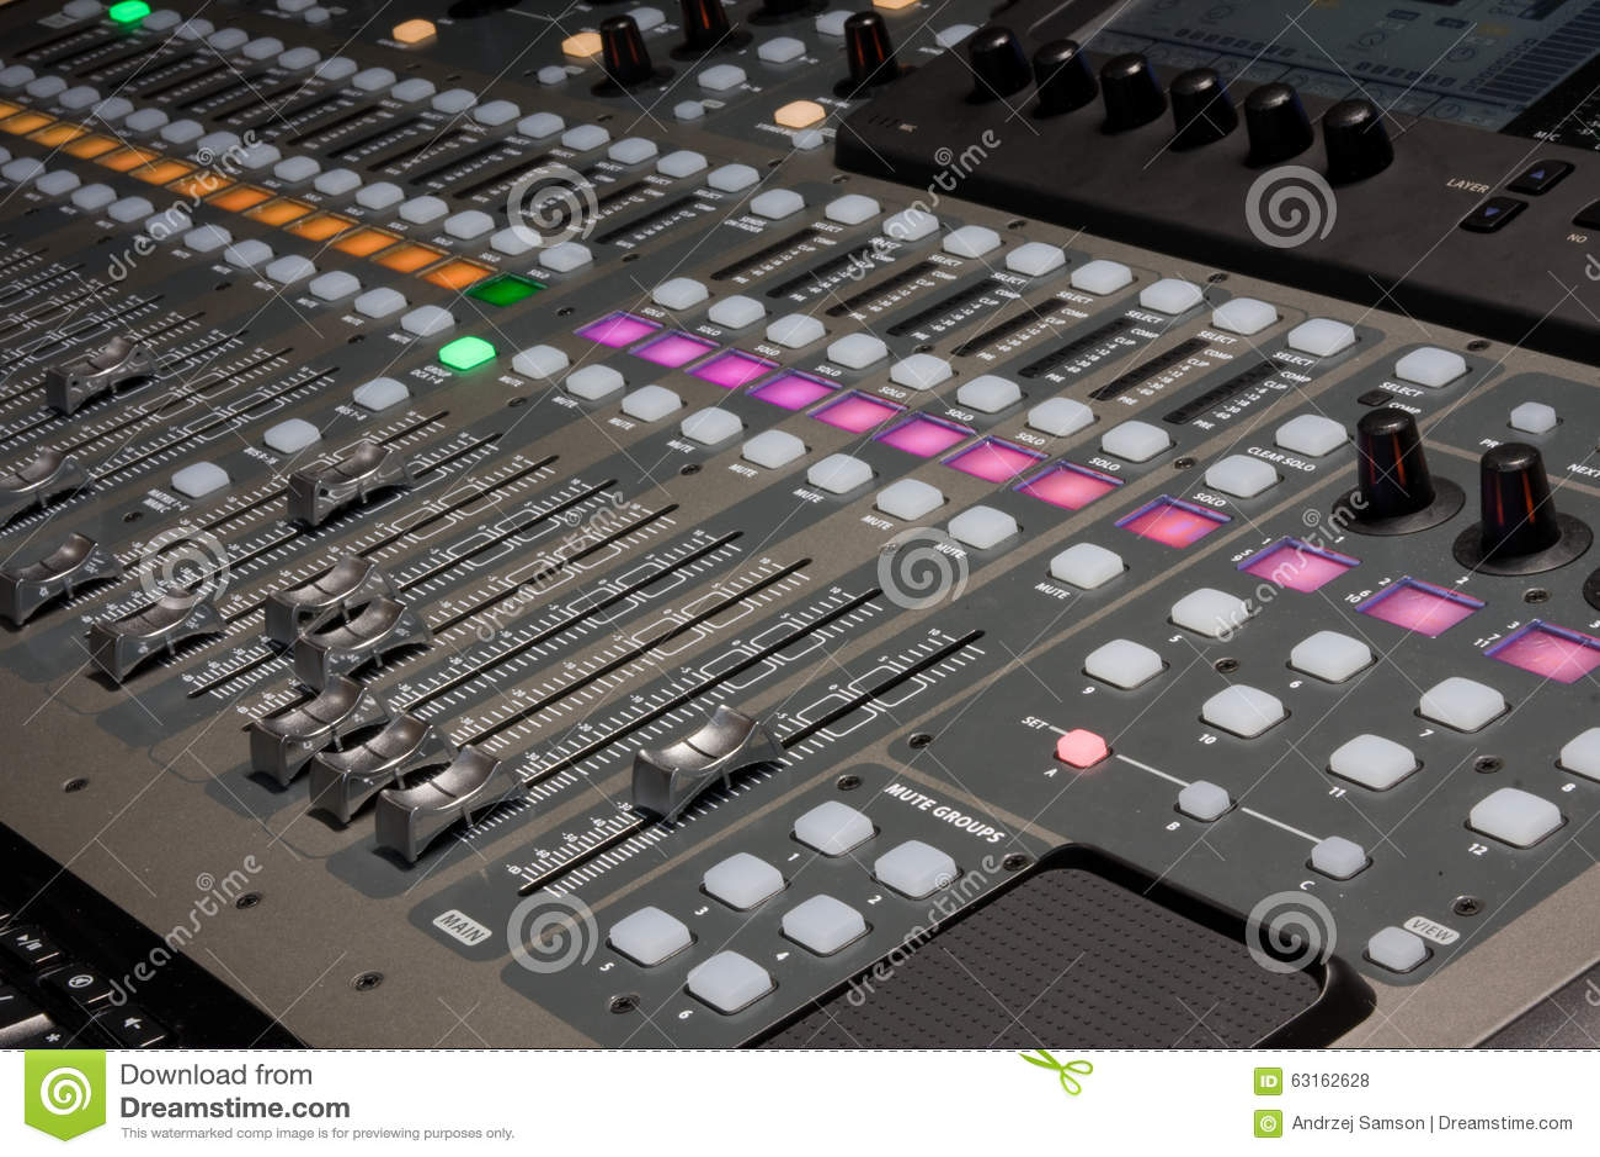 digital mixer in recording studio stock photo image of recording technology 63162628. Black Bedroom Furniture Sets. Home Design Ideas